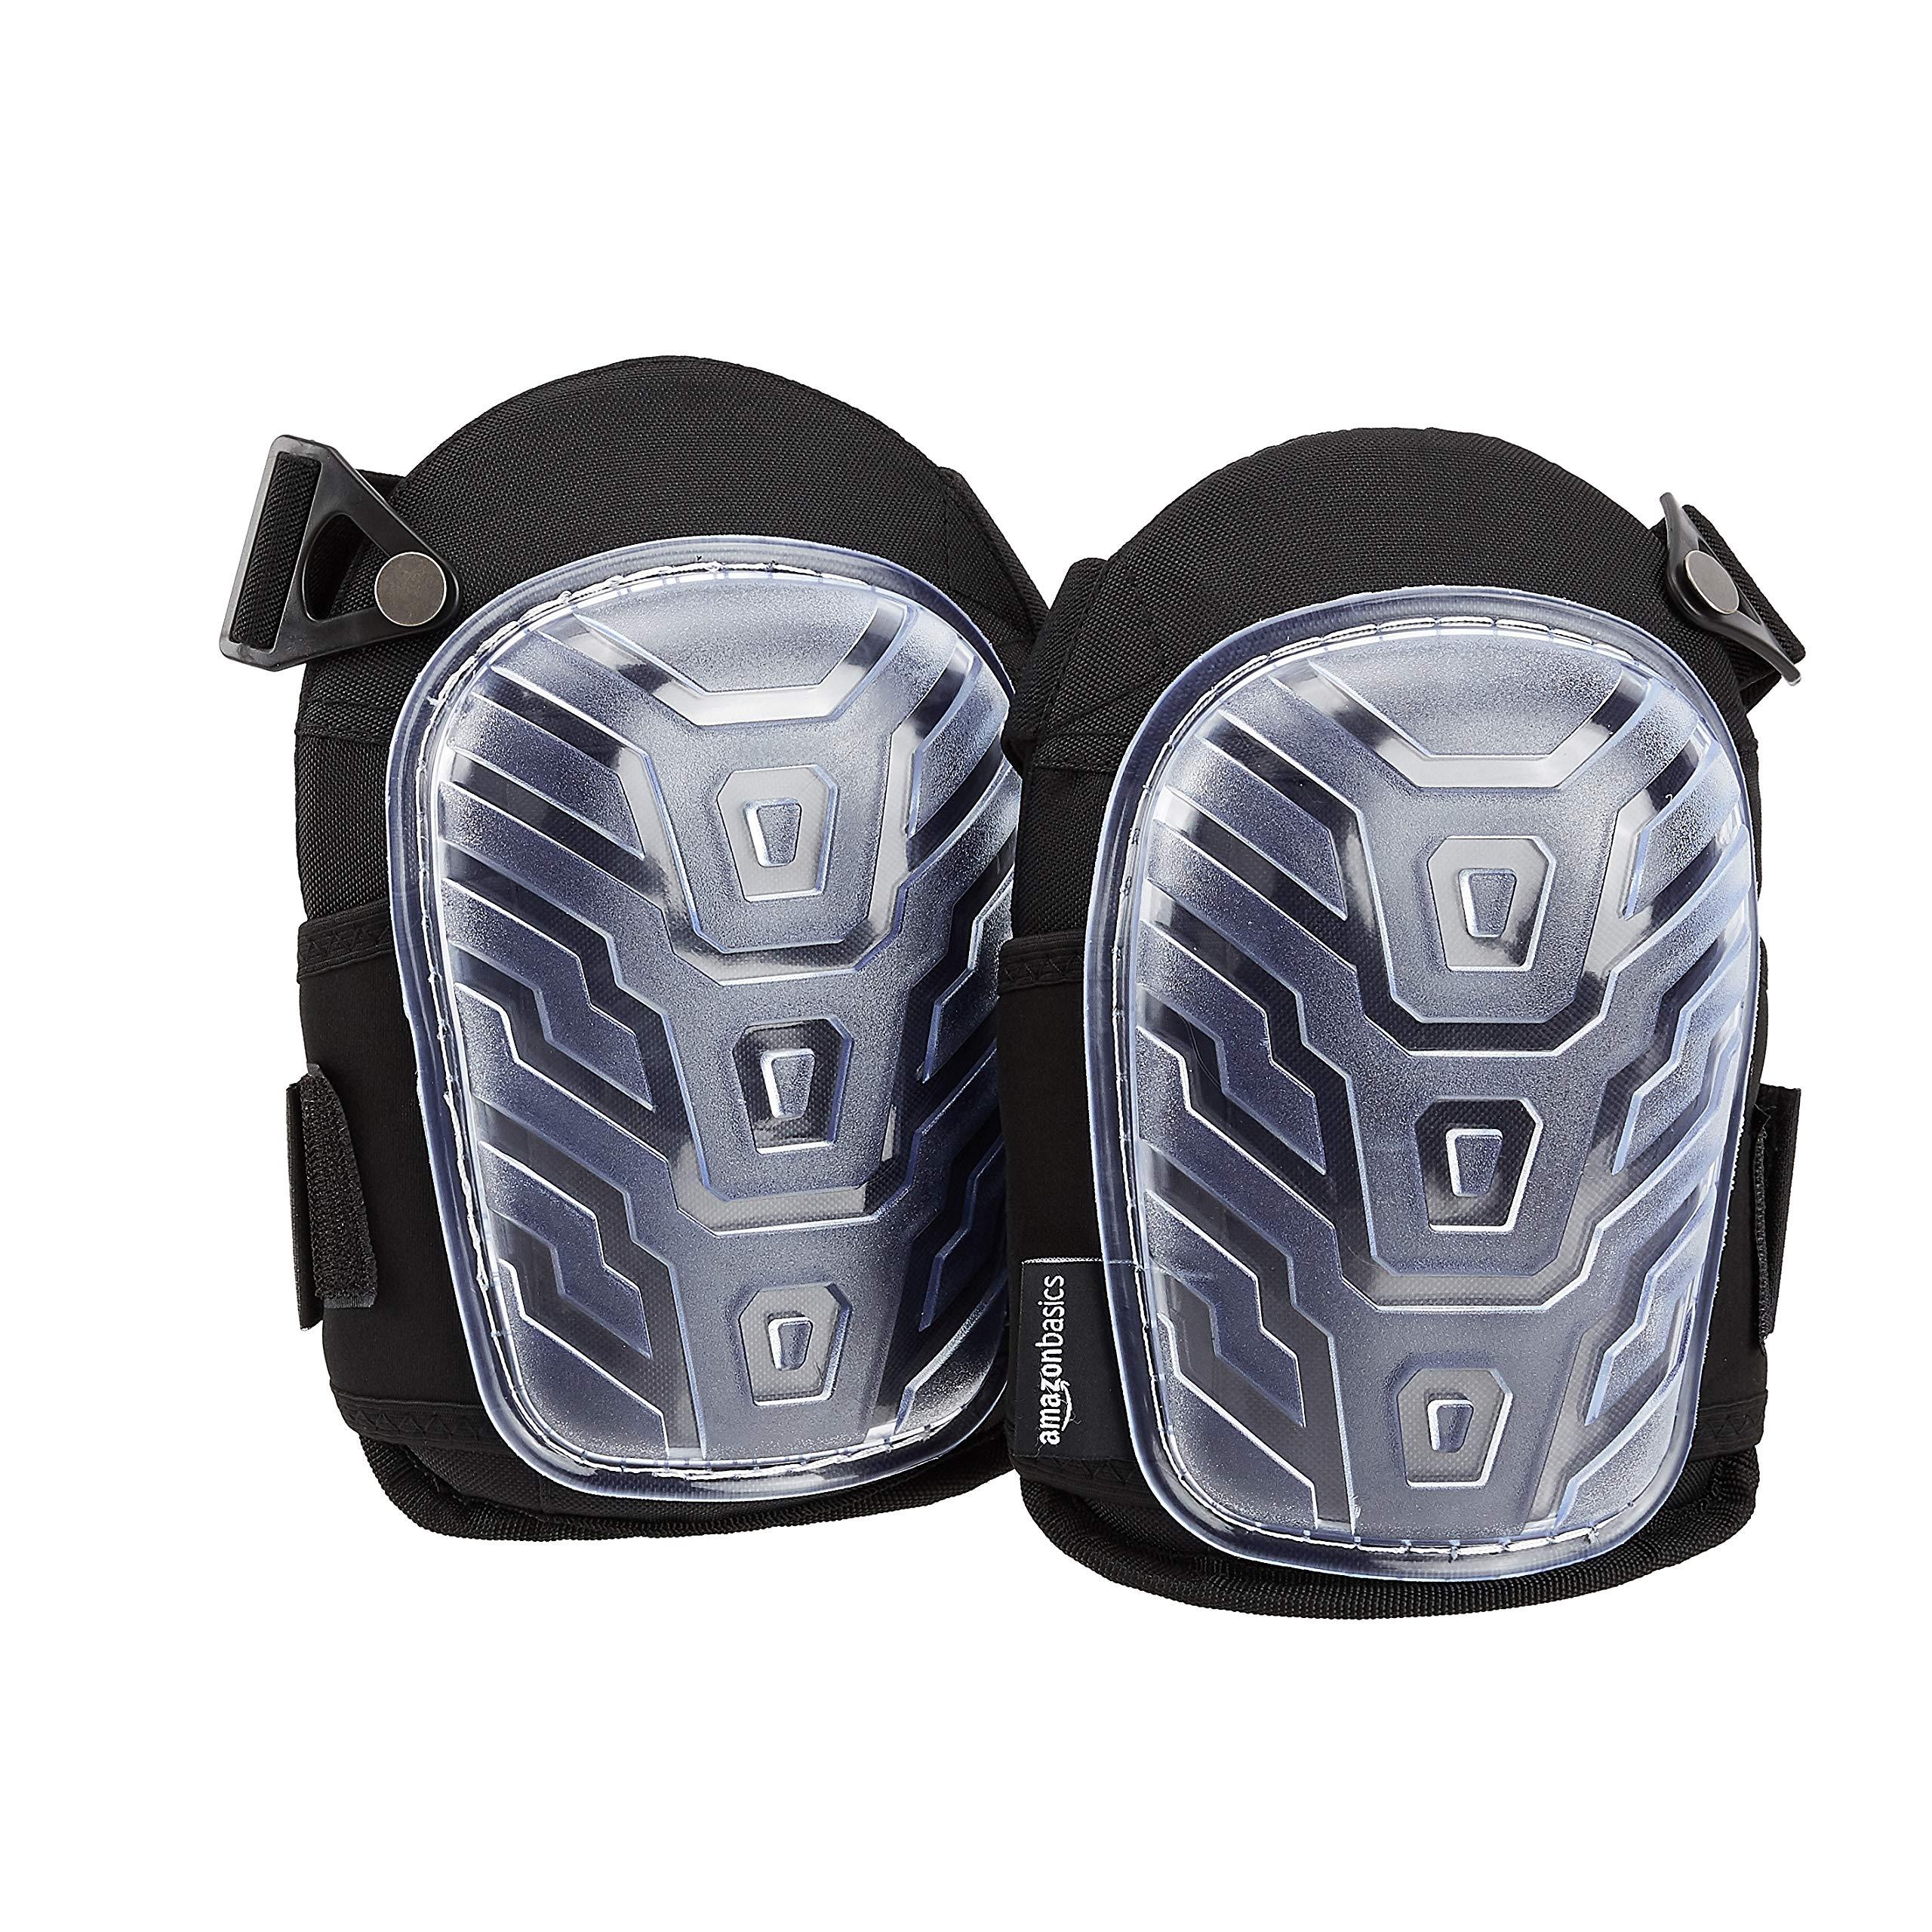 AmazonBasics Professional Gel Cushion Knee Pads,Clear